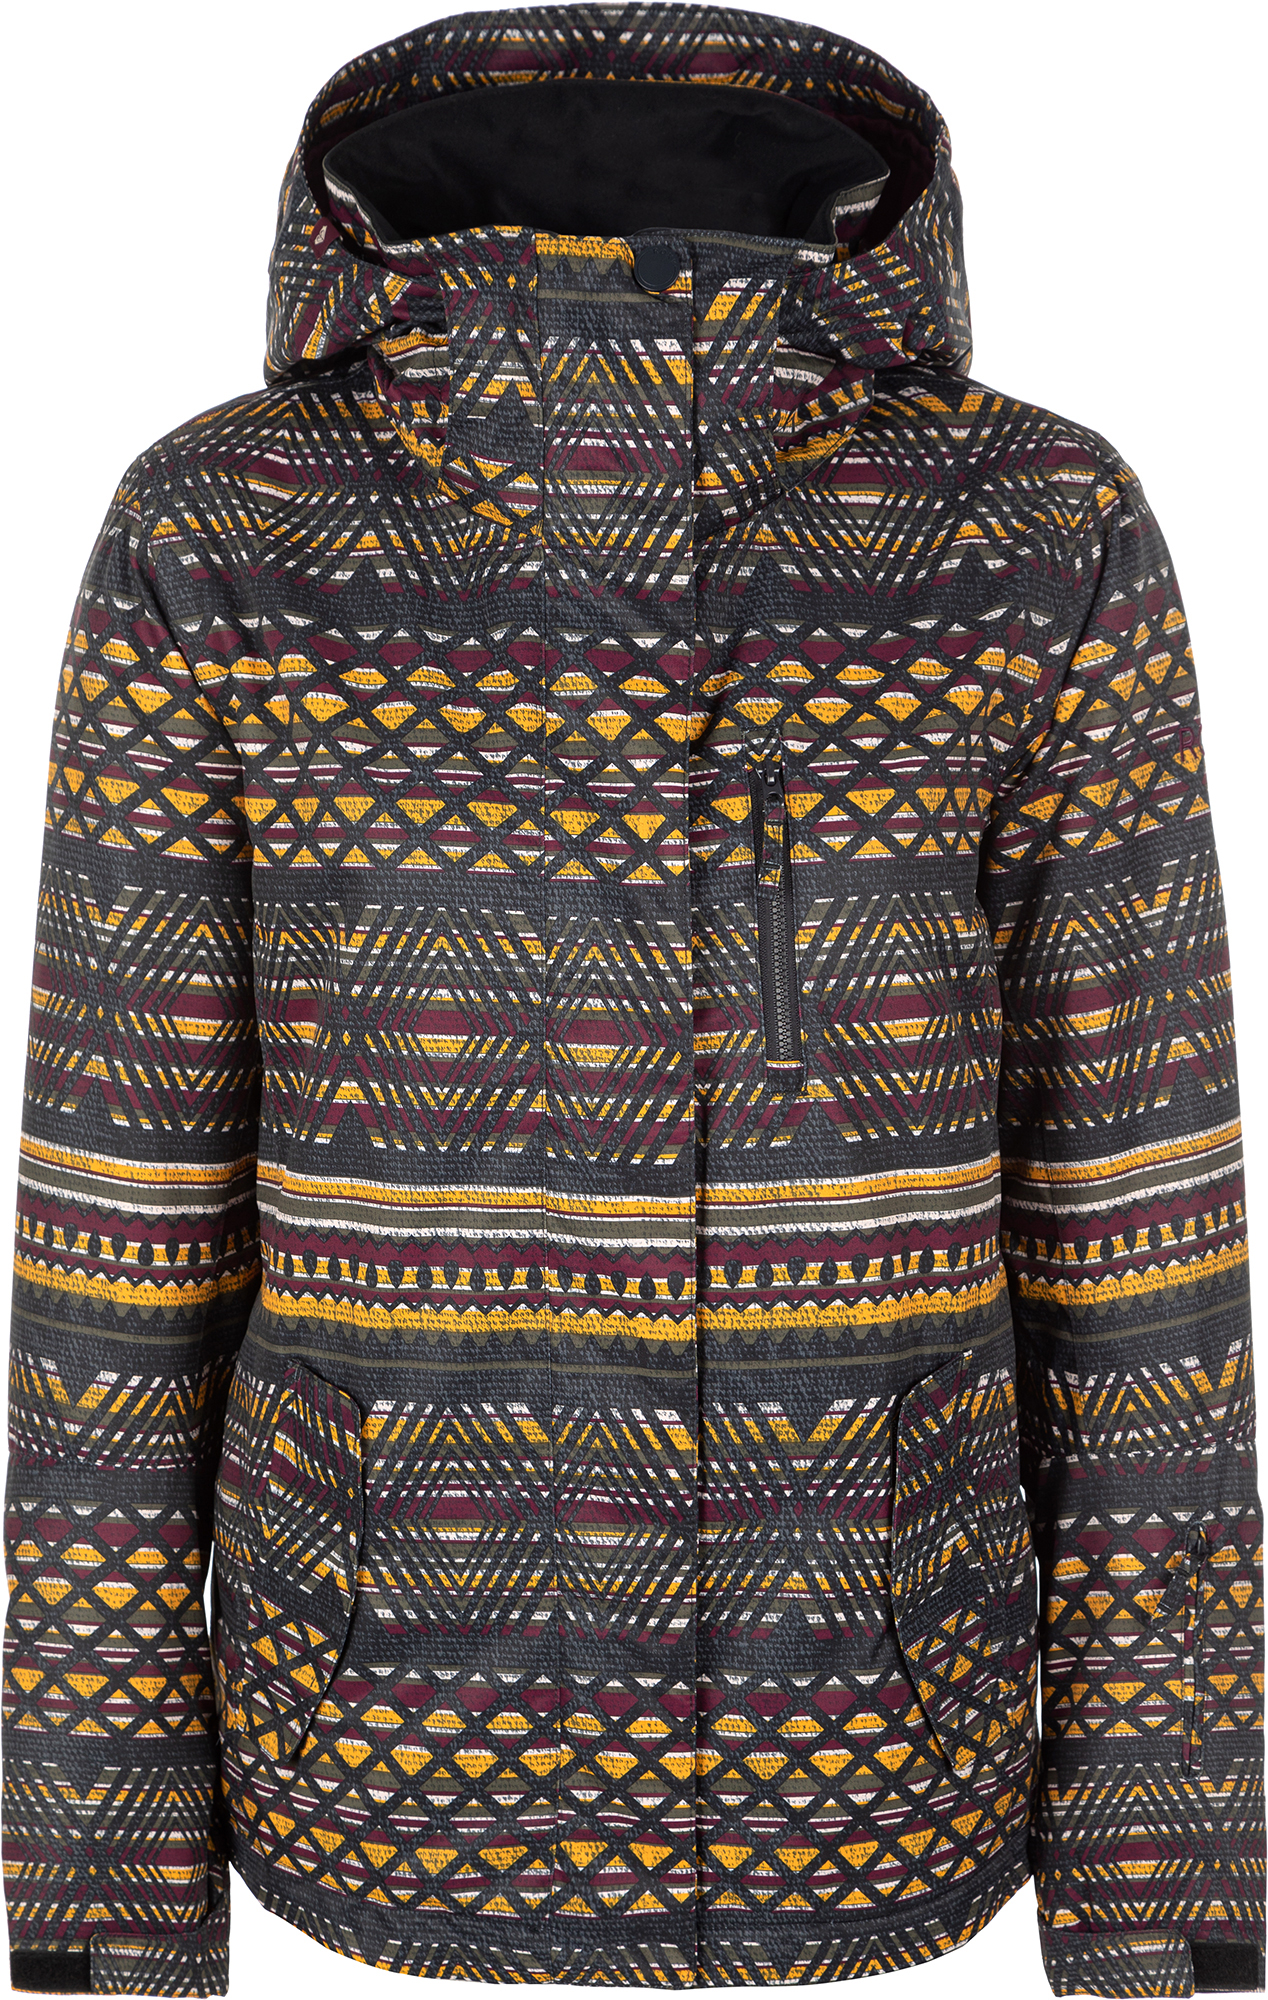 Roxy Куртка женская Roxy Jetty JK, размер 40-42 куртка женская oodji ultra цвет бежевый 10304291 19781 3300n размер 34 170 40 170